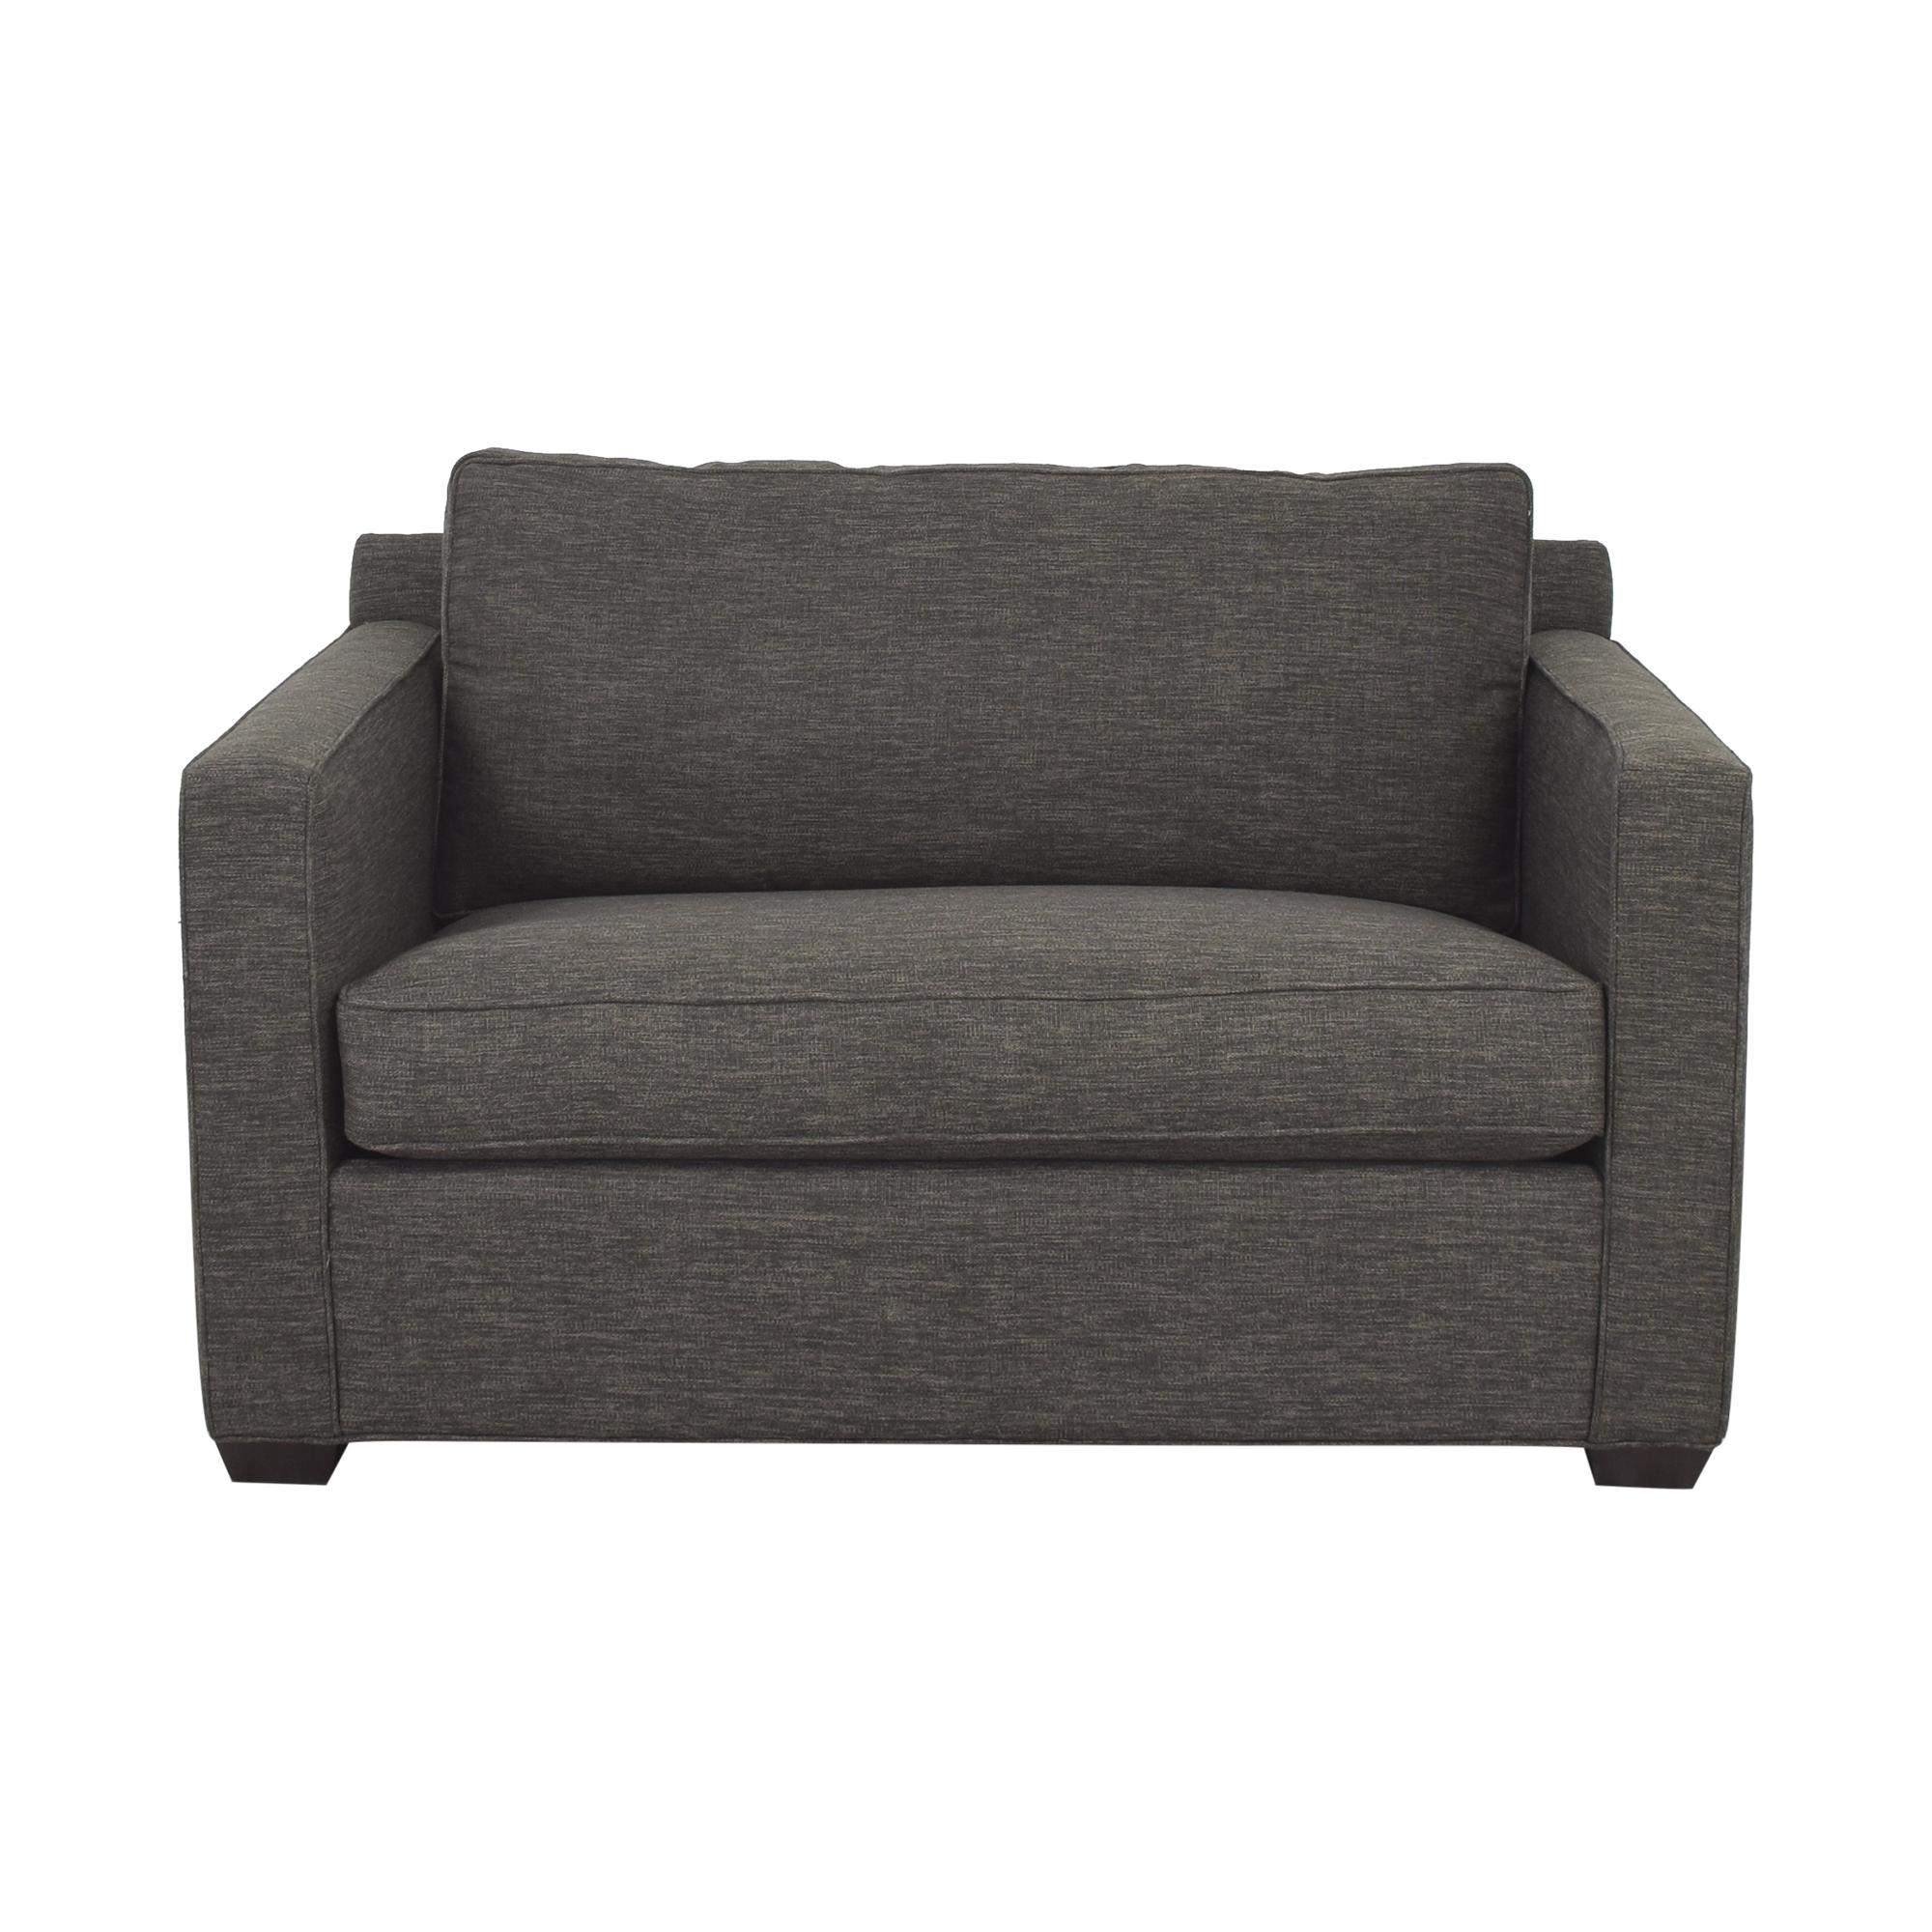 Crate & Barrel Crate & Barrel Twin Sleeper Sofa for sale